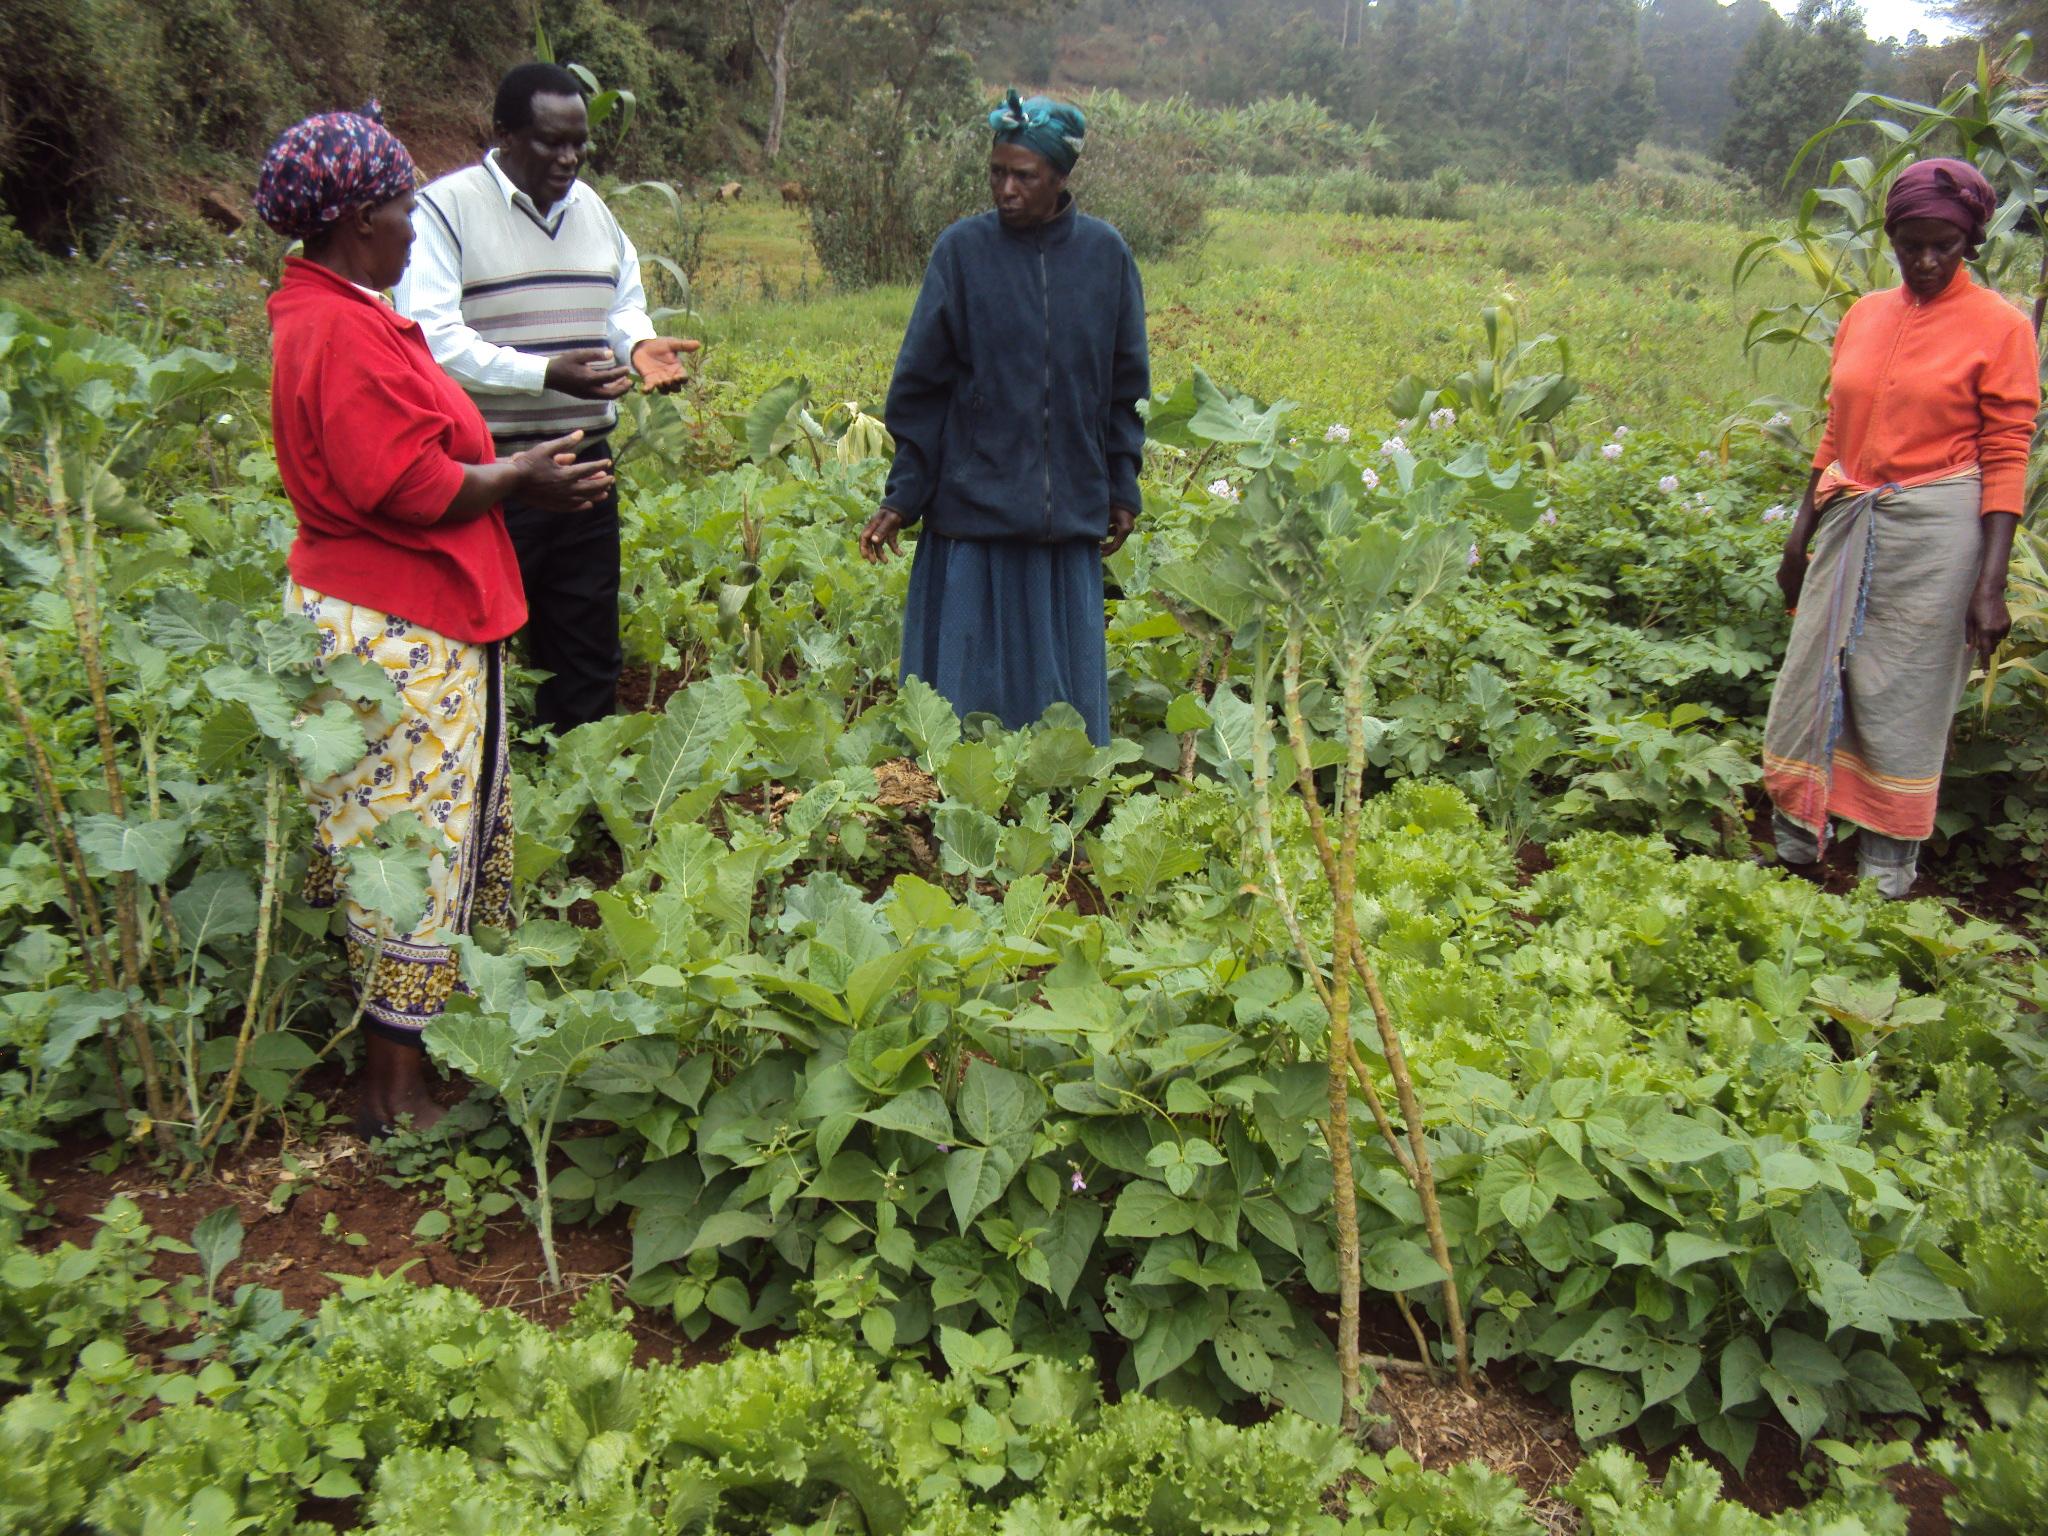 Organic fertiliser and pest control